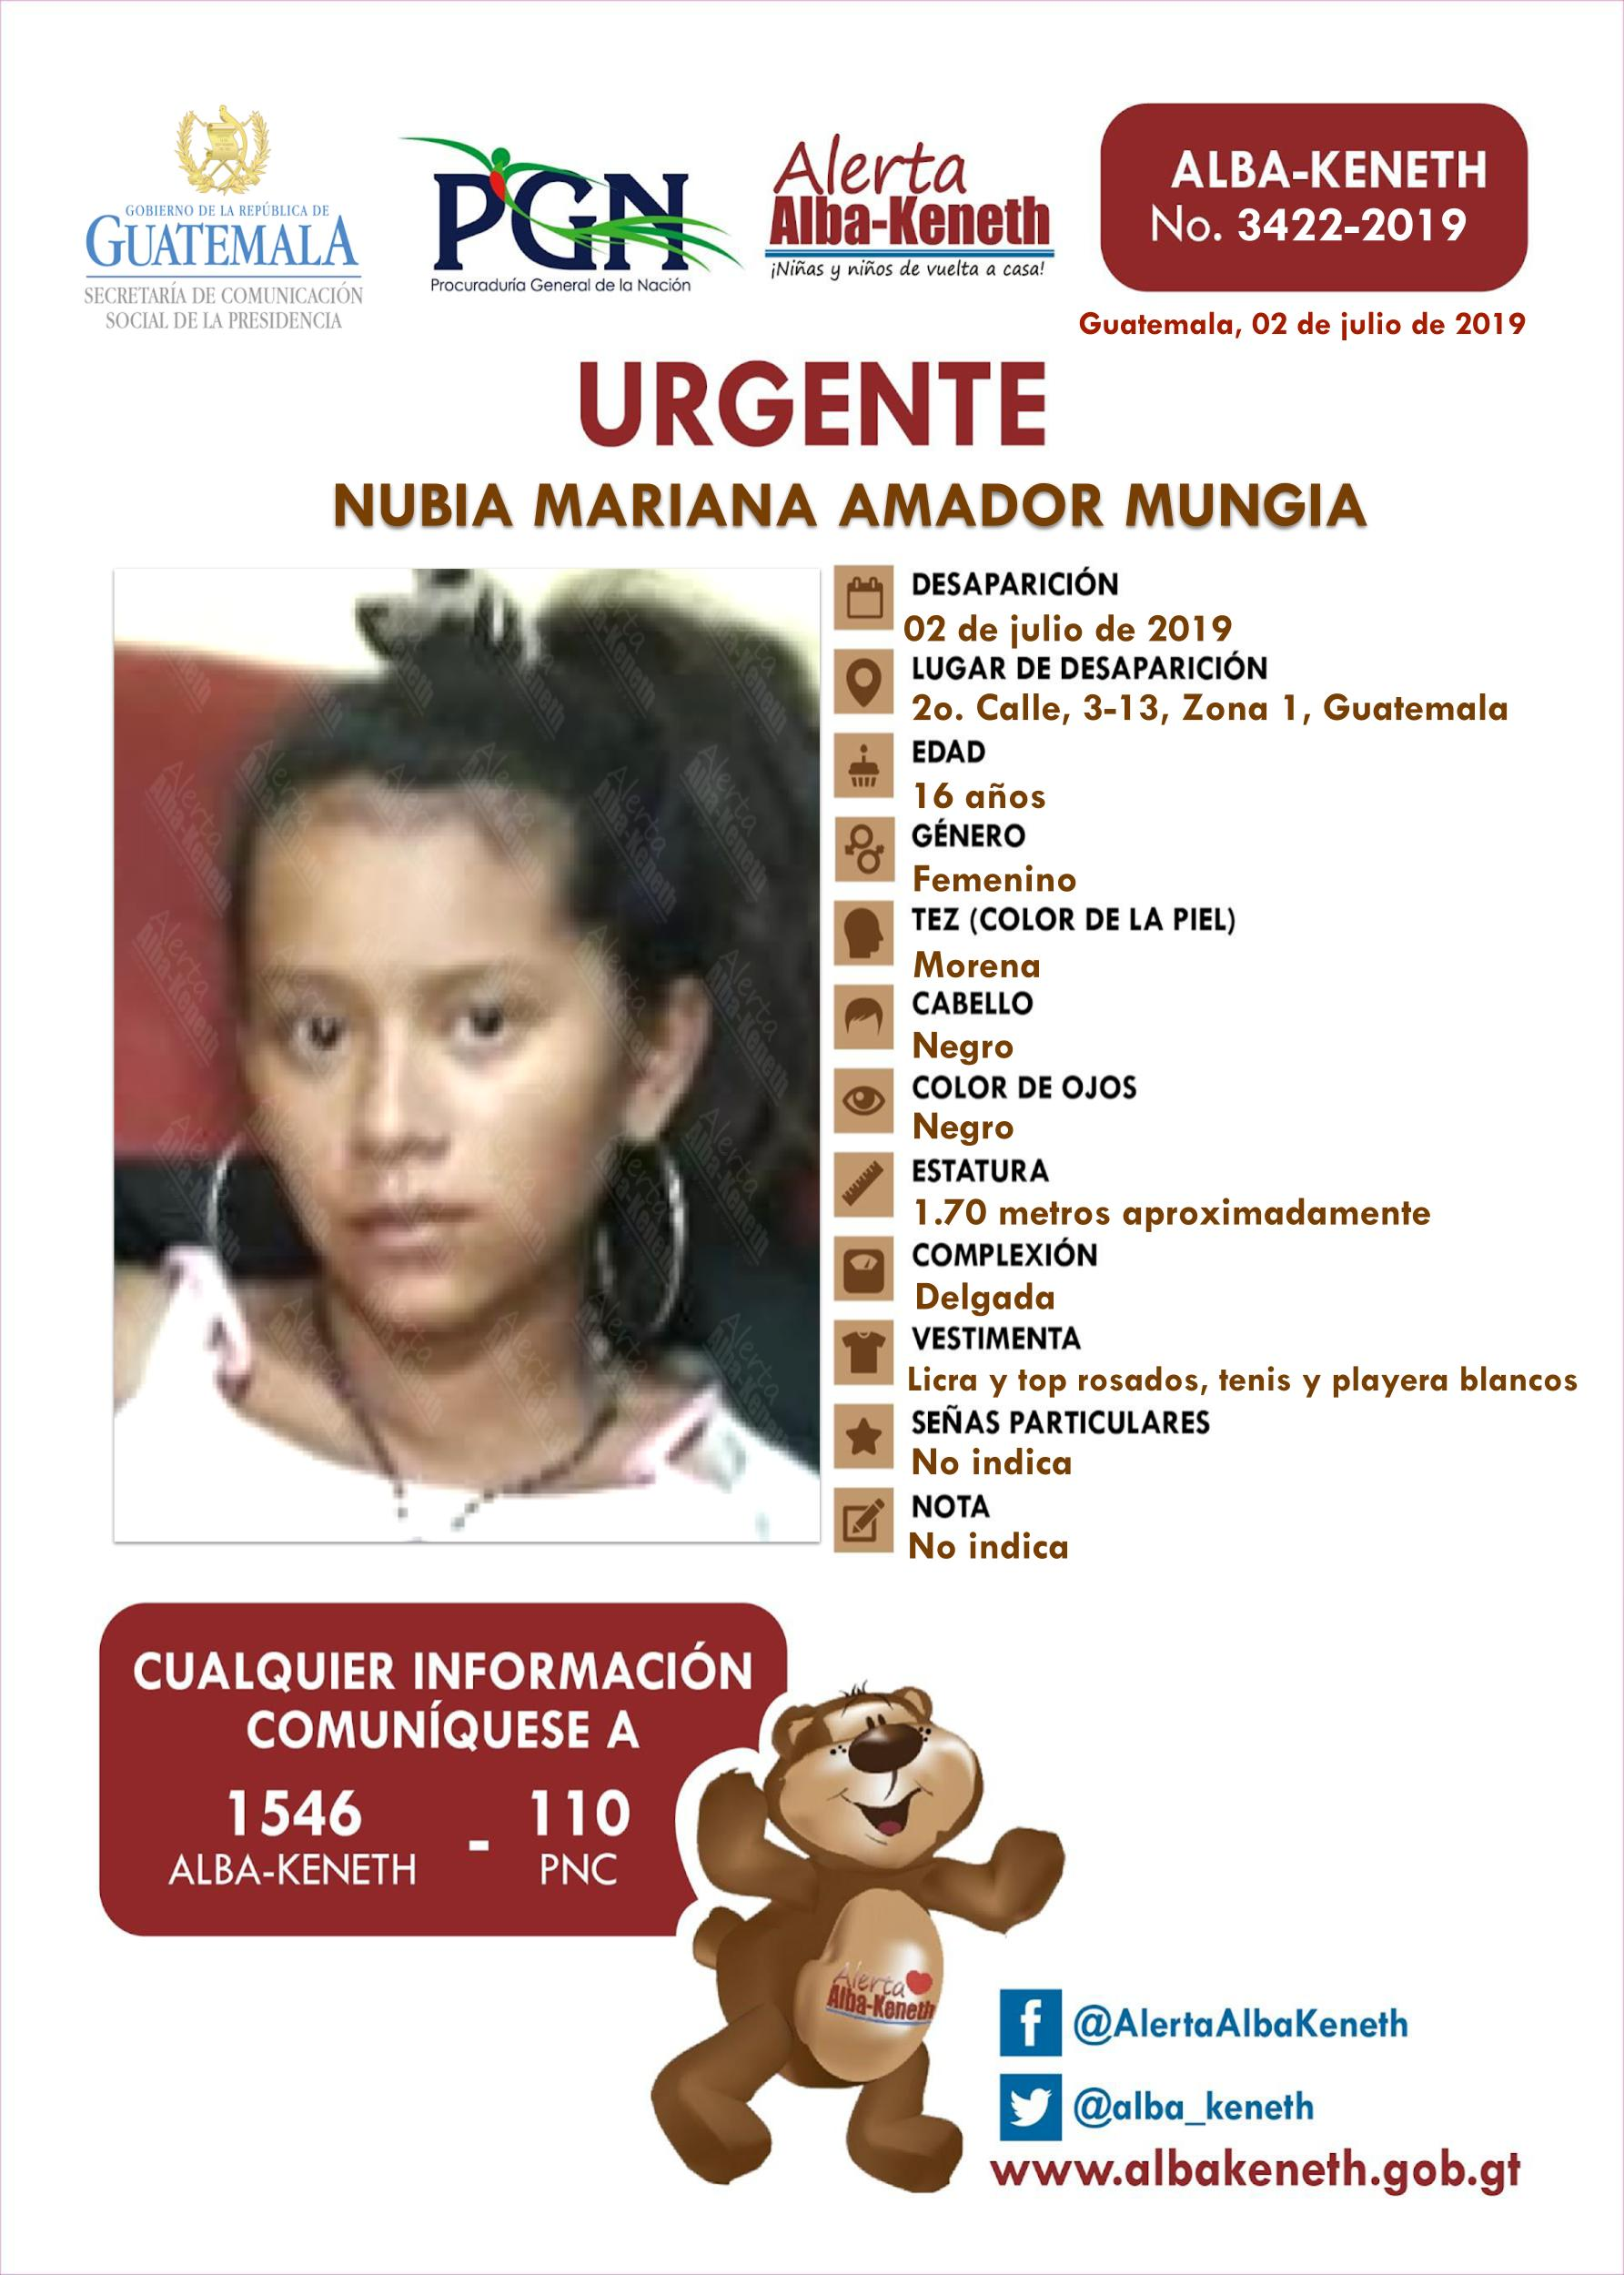 Nubia Mariana Amador Mungia